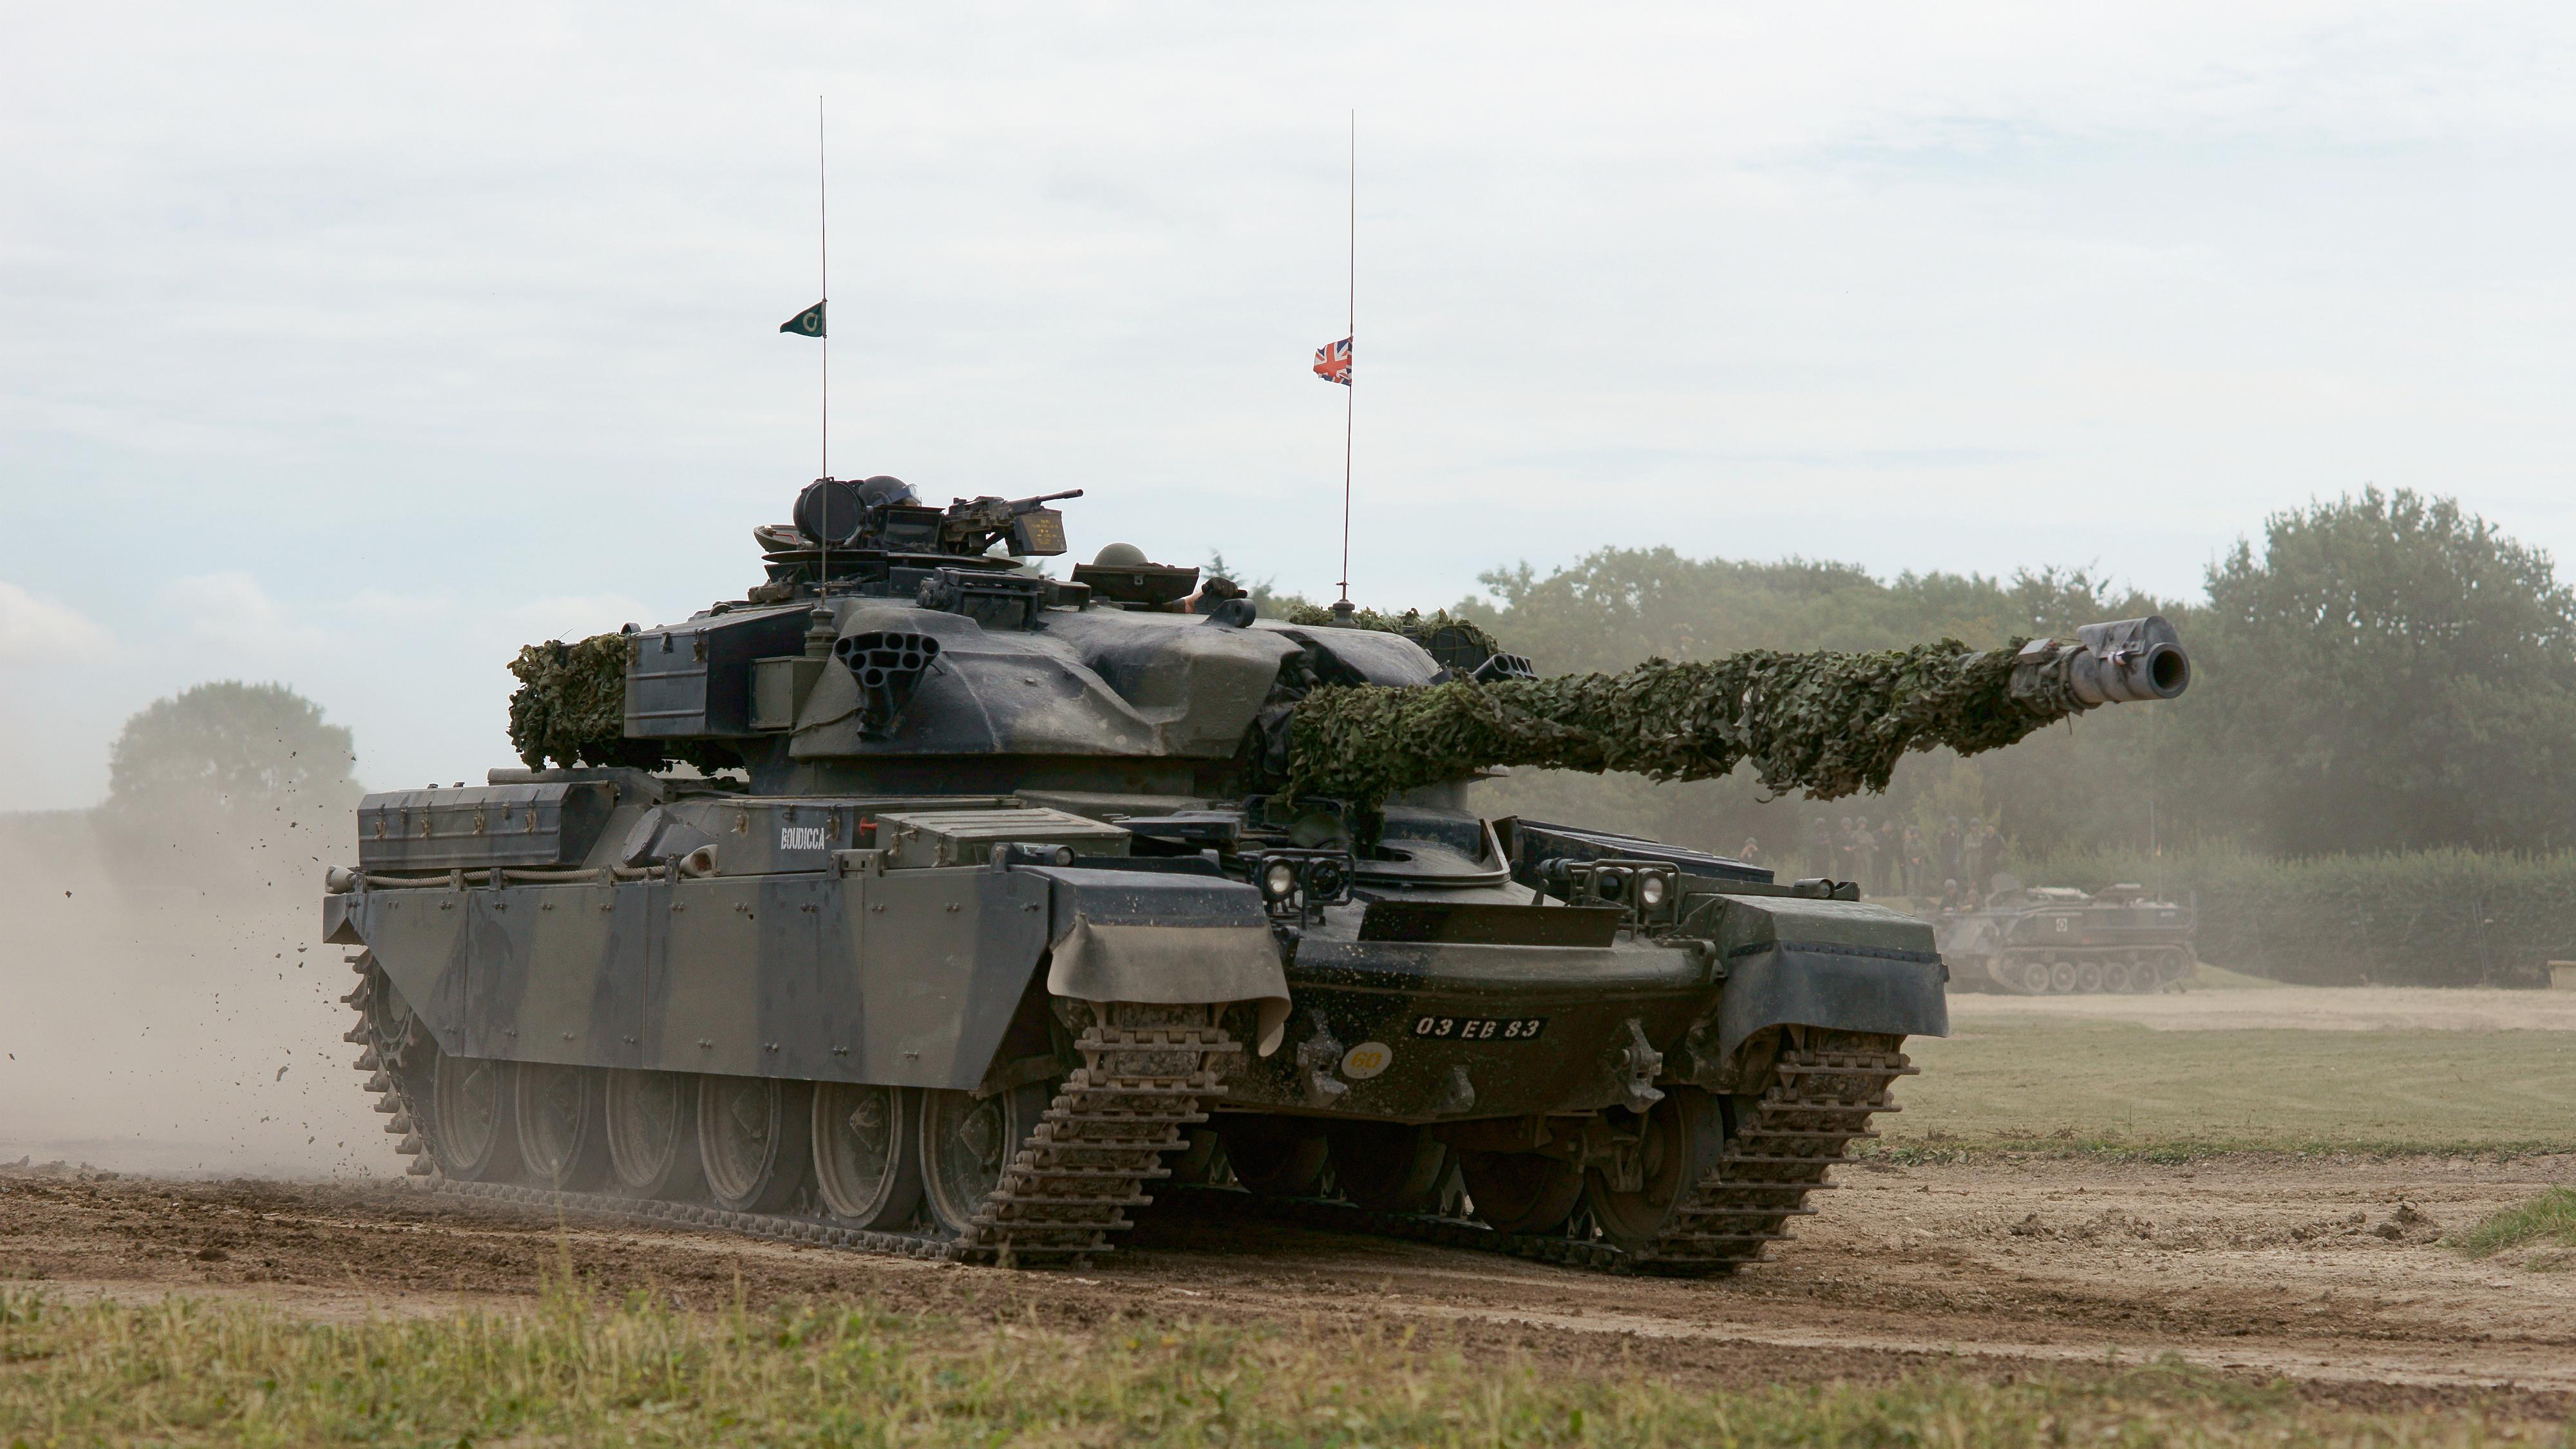 Chieftain (tank) - Wikipedia